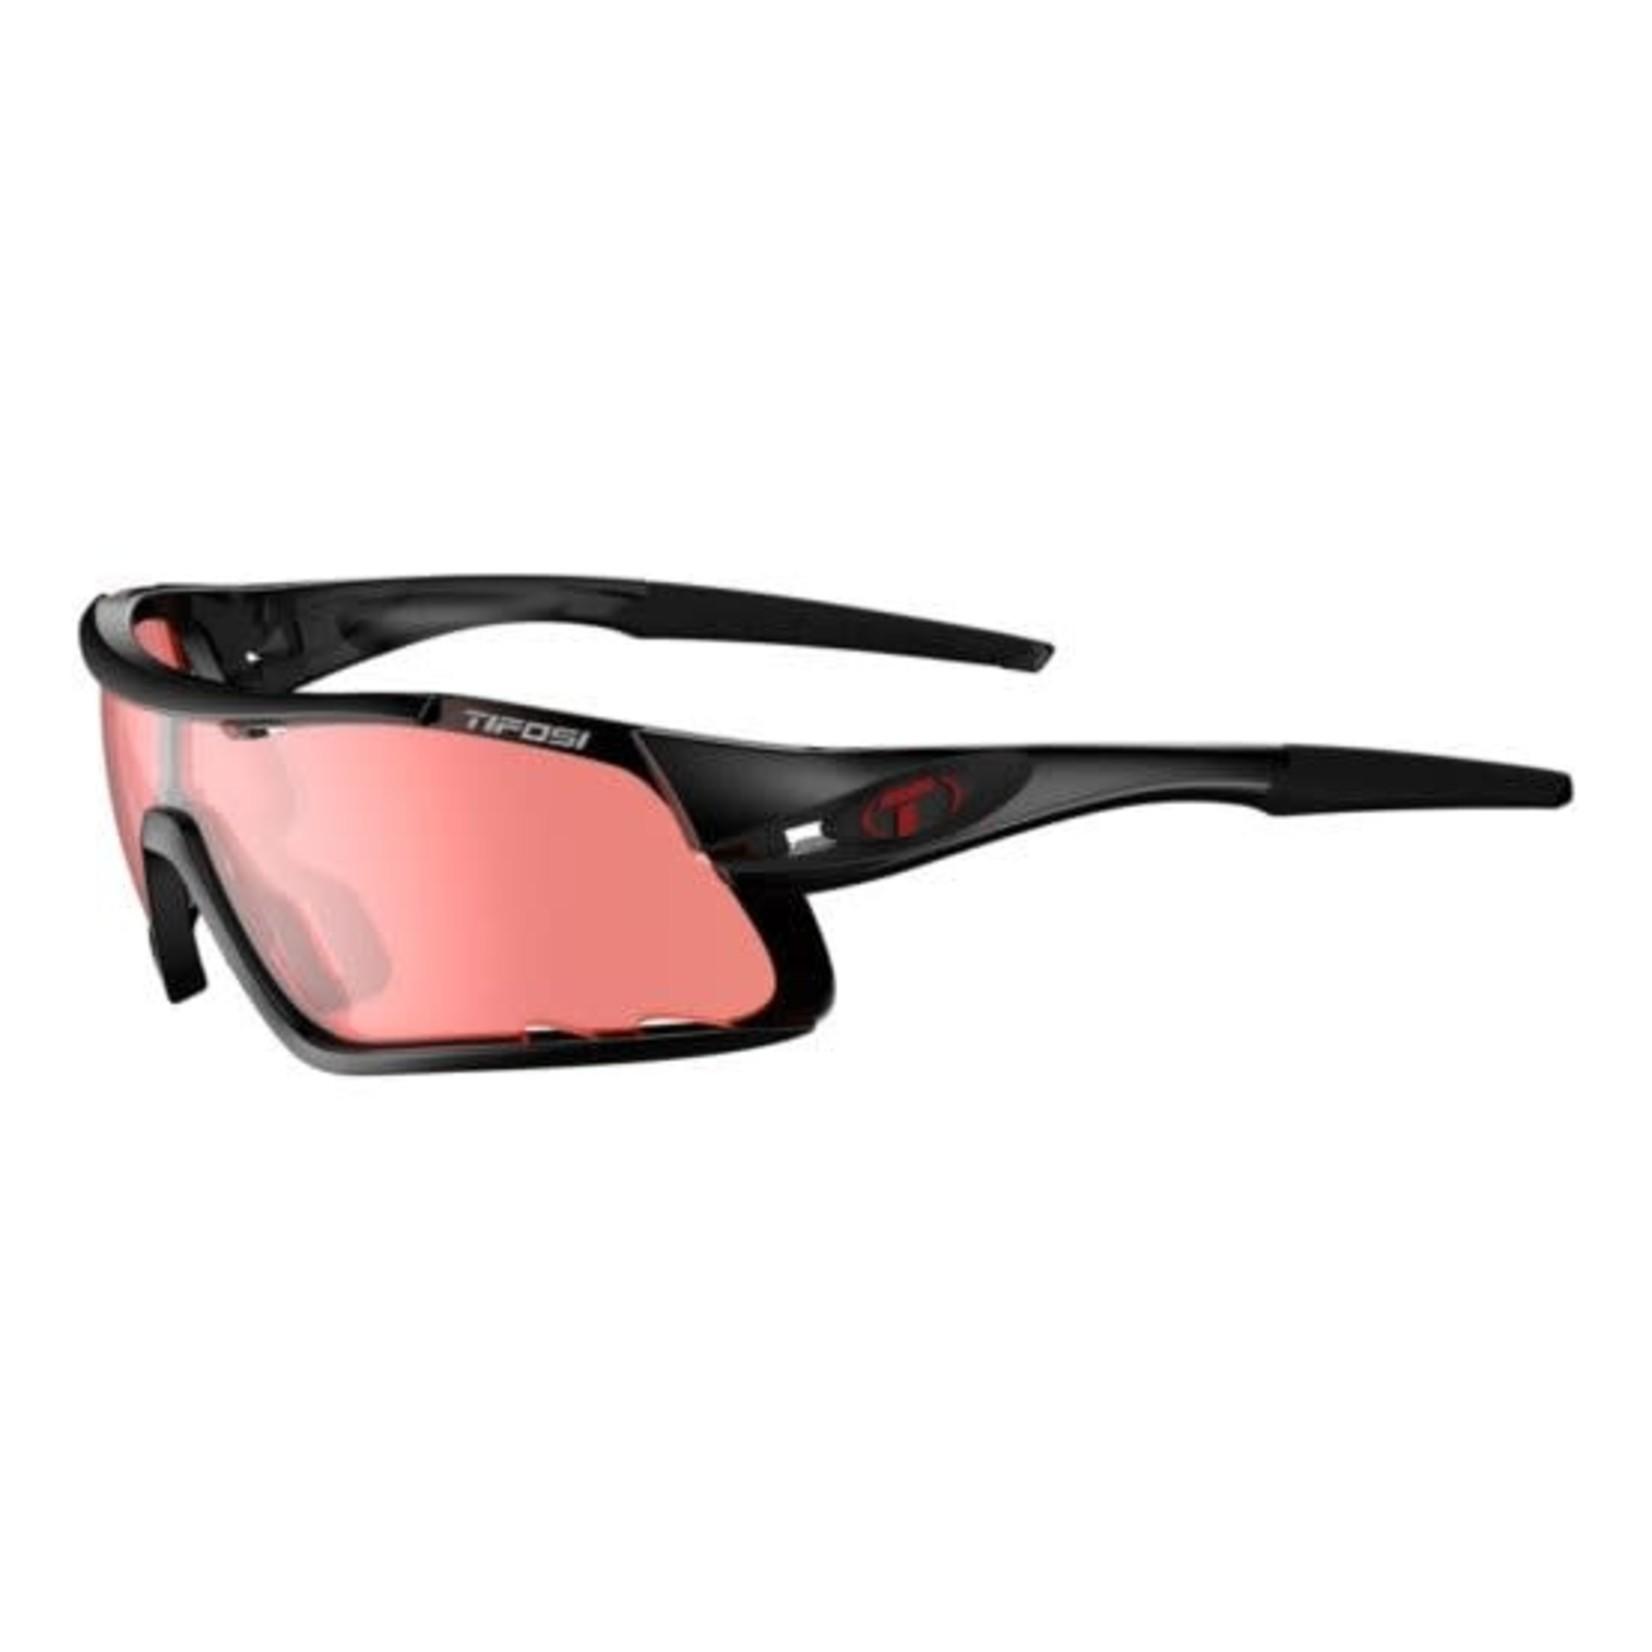 Tifosi Optics Davos, Crystal Black Single Lens Sunglasses